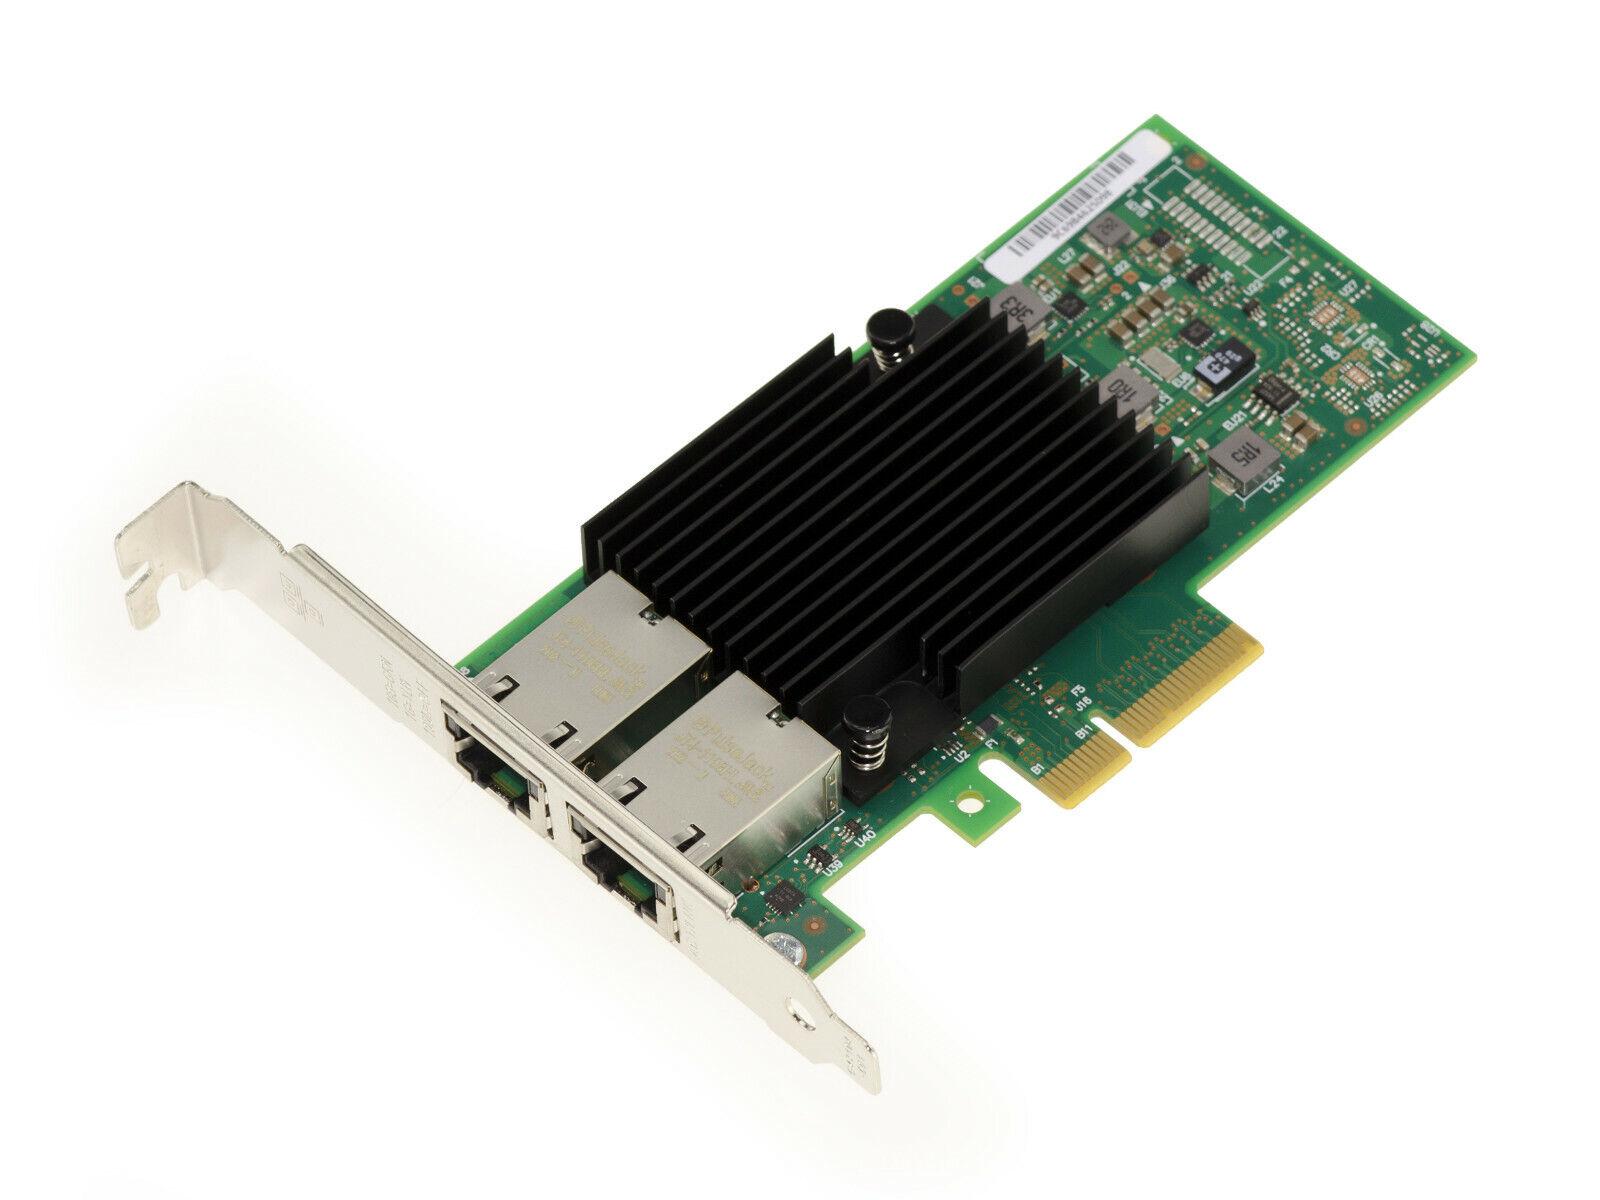 Card Pcie 3.0 4x 1G 2.5G 10G RJ45 Lan Gigabit Ethernet Chipset Intel X550AT2